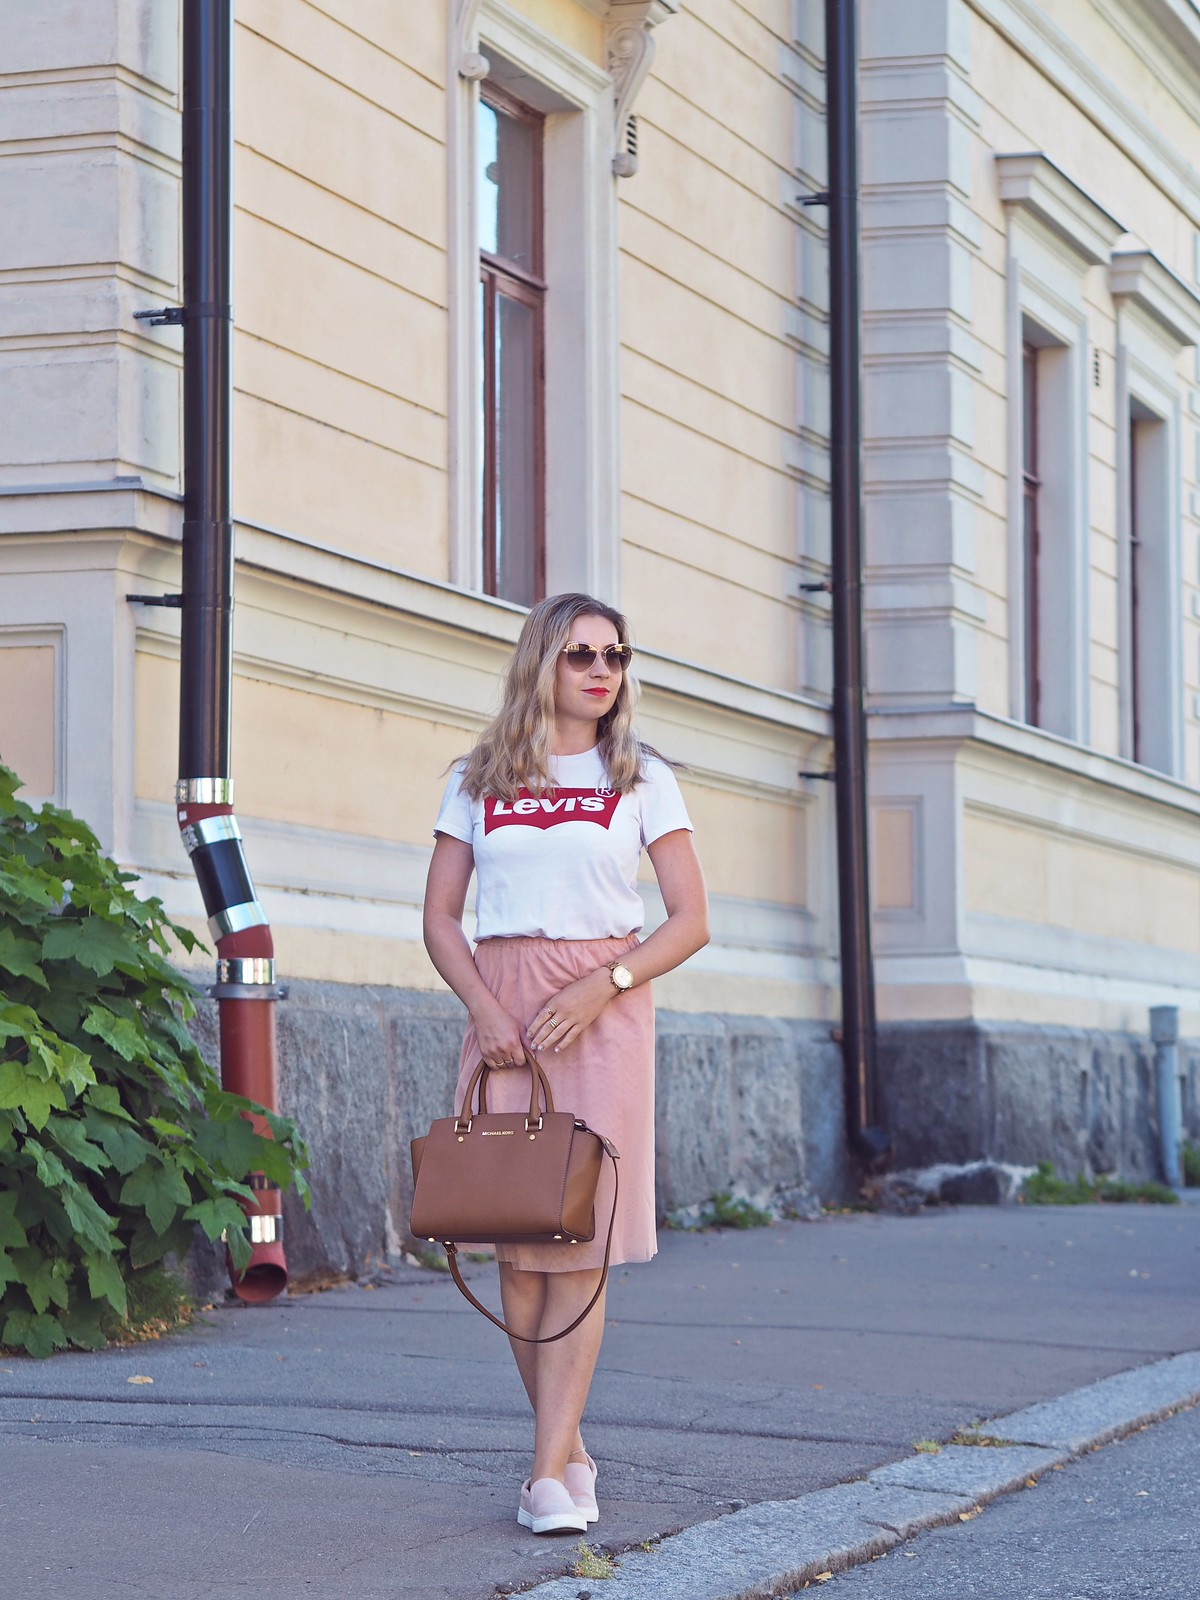 dirtypink skirt